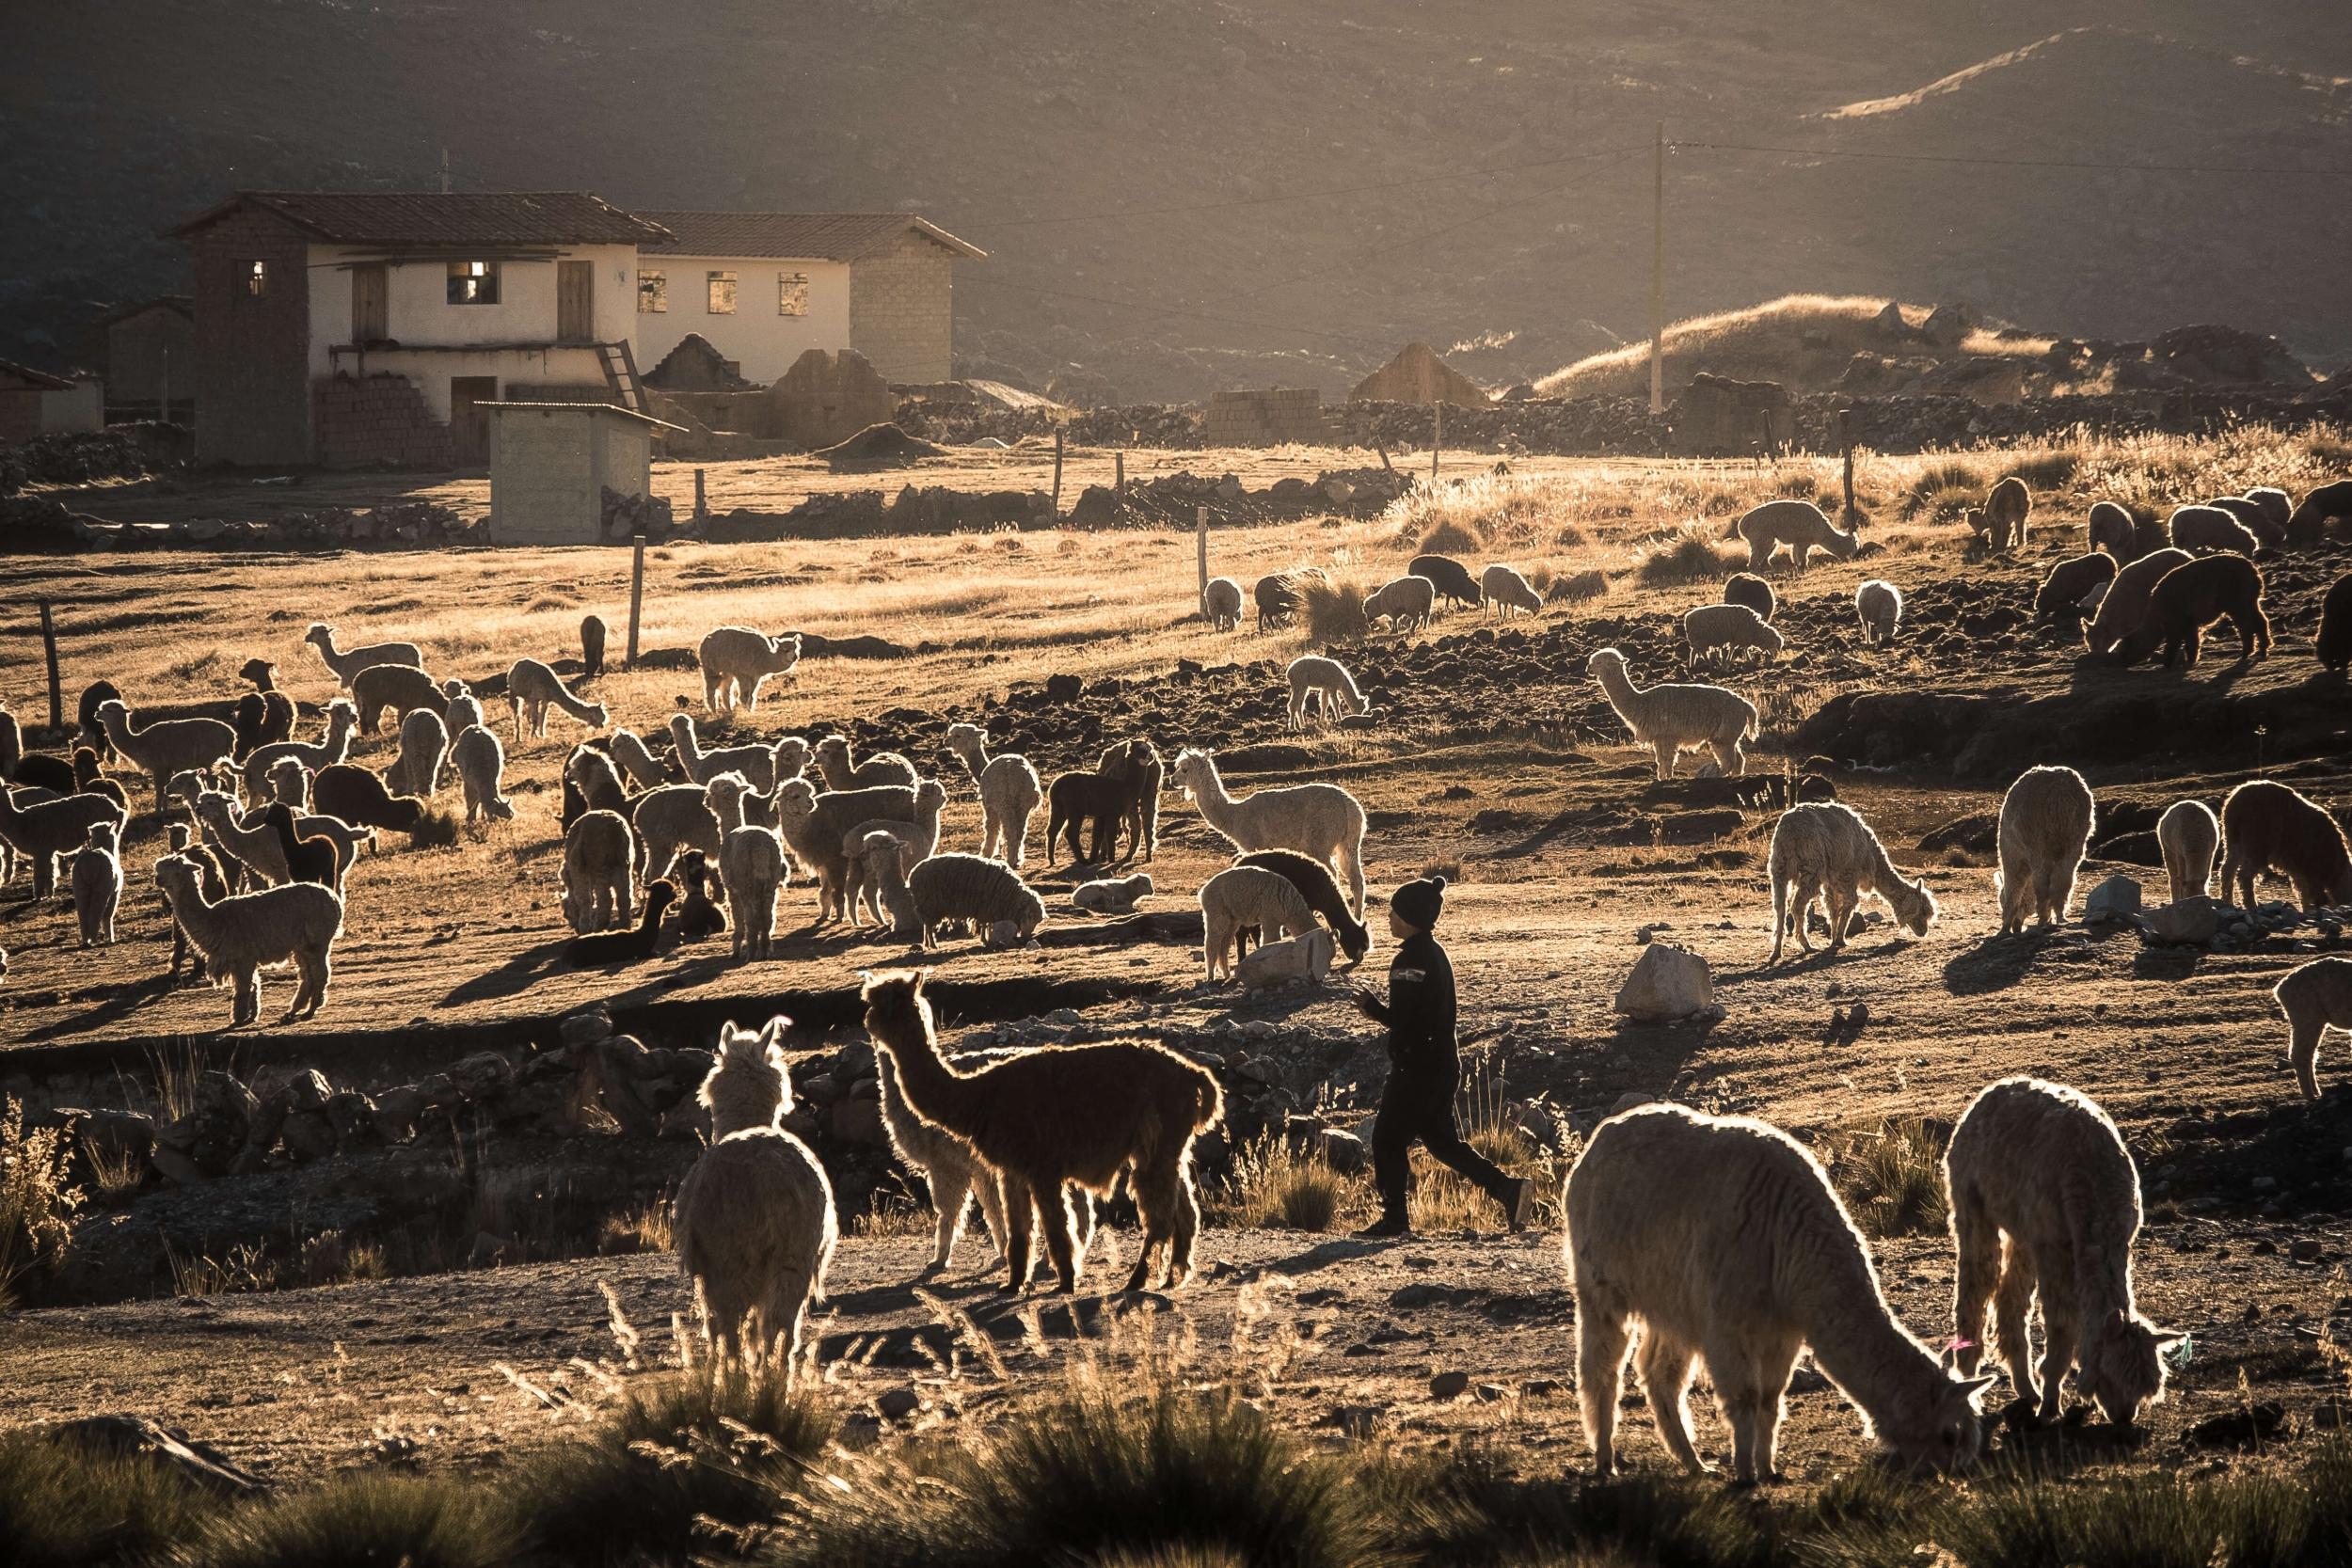 Qoyllur Riti, Qoylluriti, Festival, religion, Andes, Pérou, Ausangate, Cuzco, Culture, célébrations, Quéchua